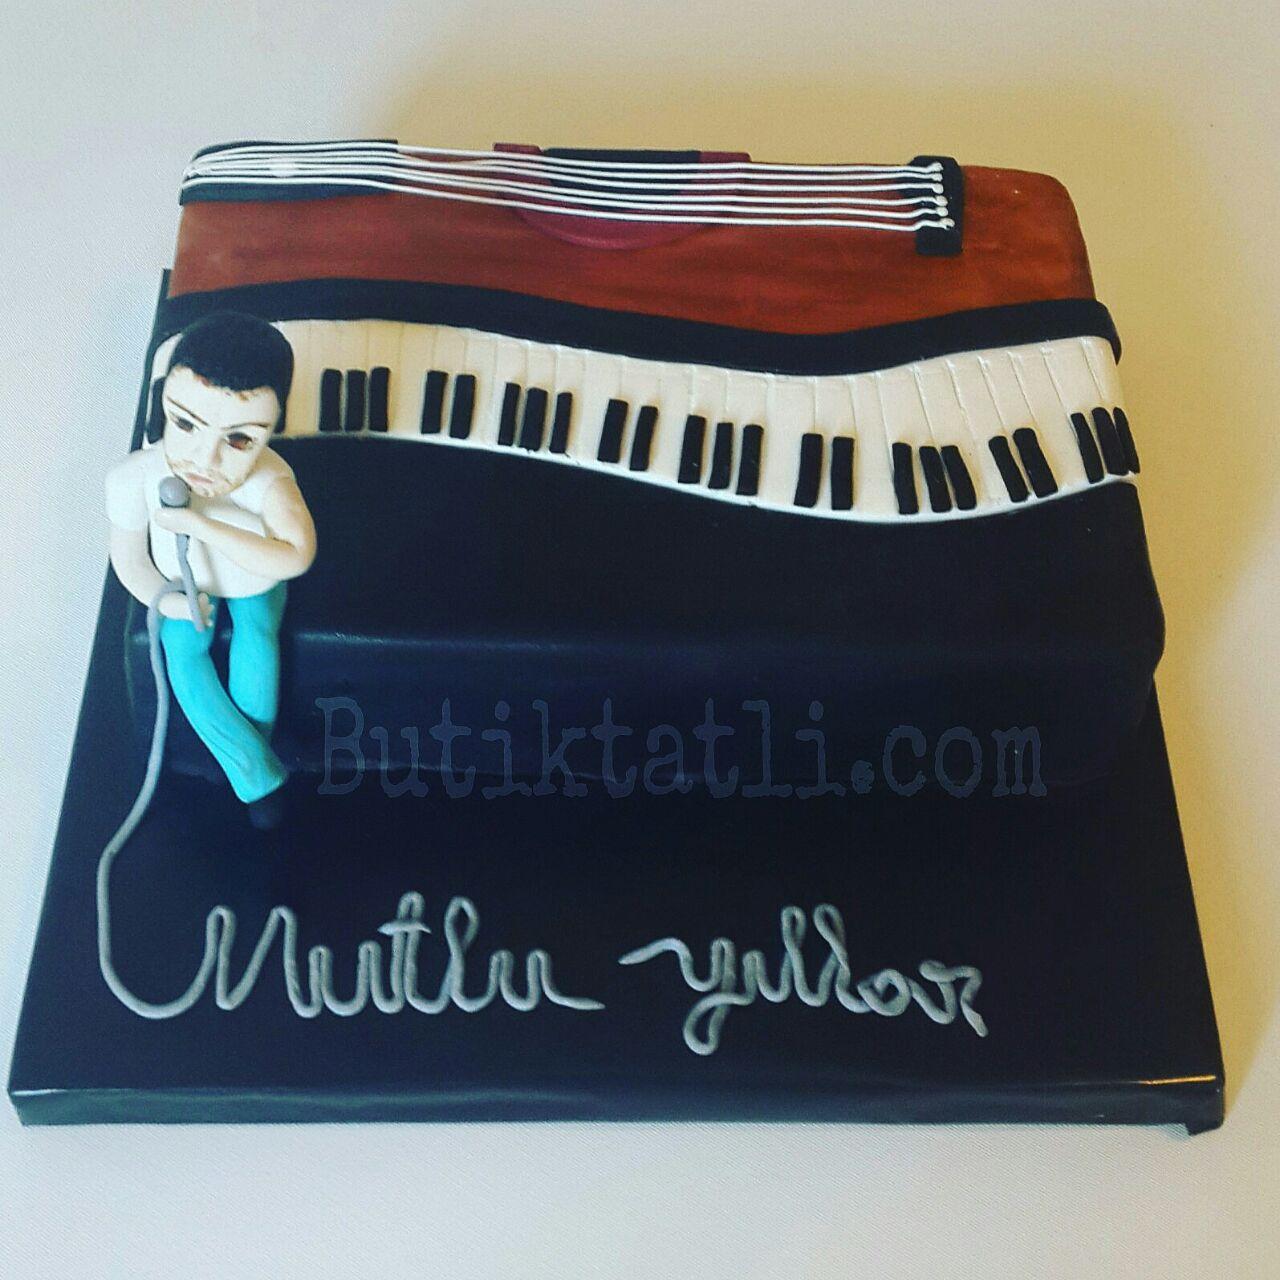 piyano-keman-pasta.jpg